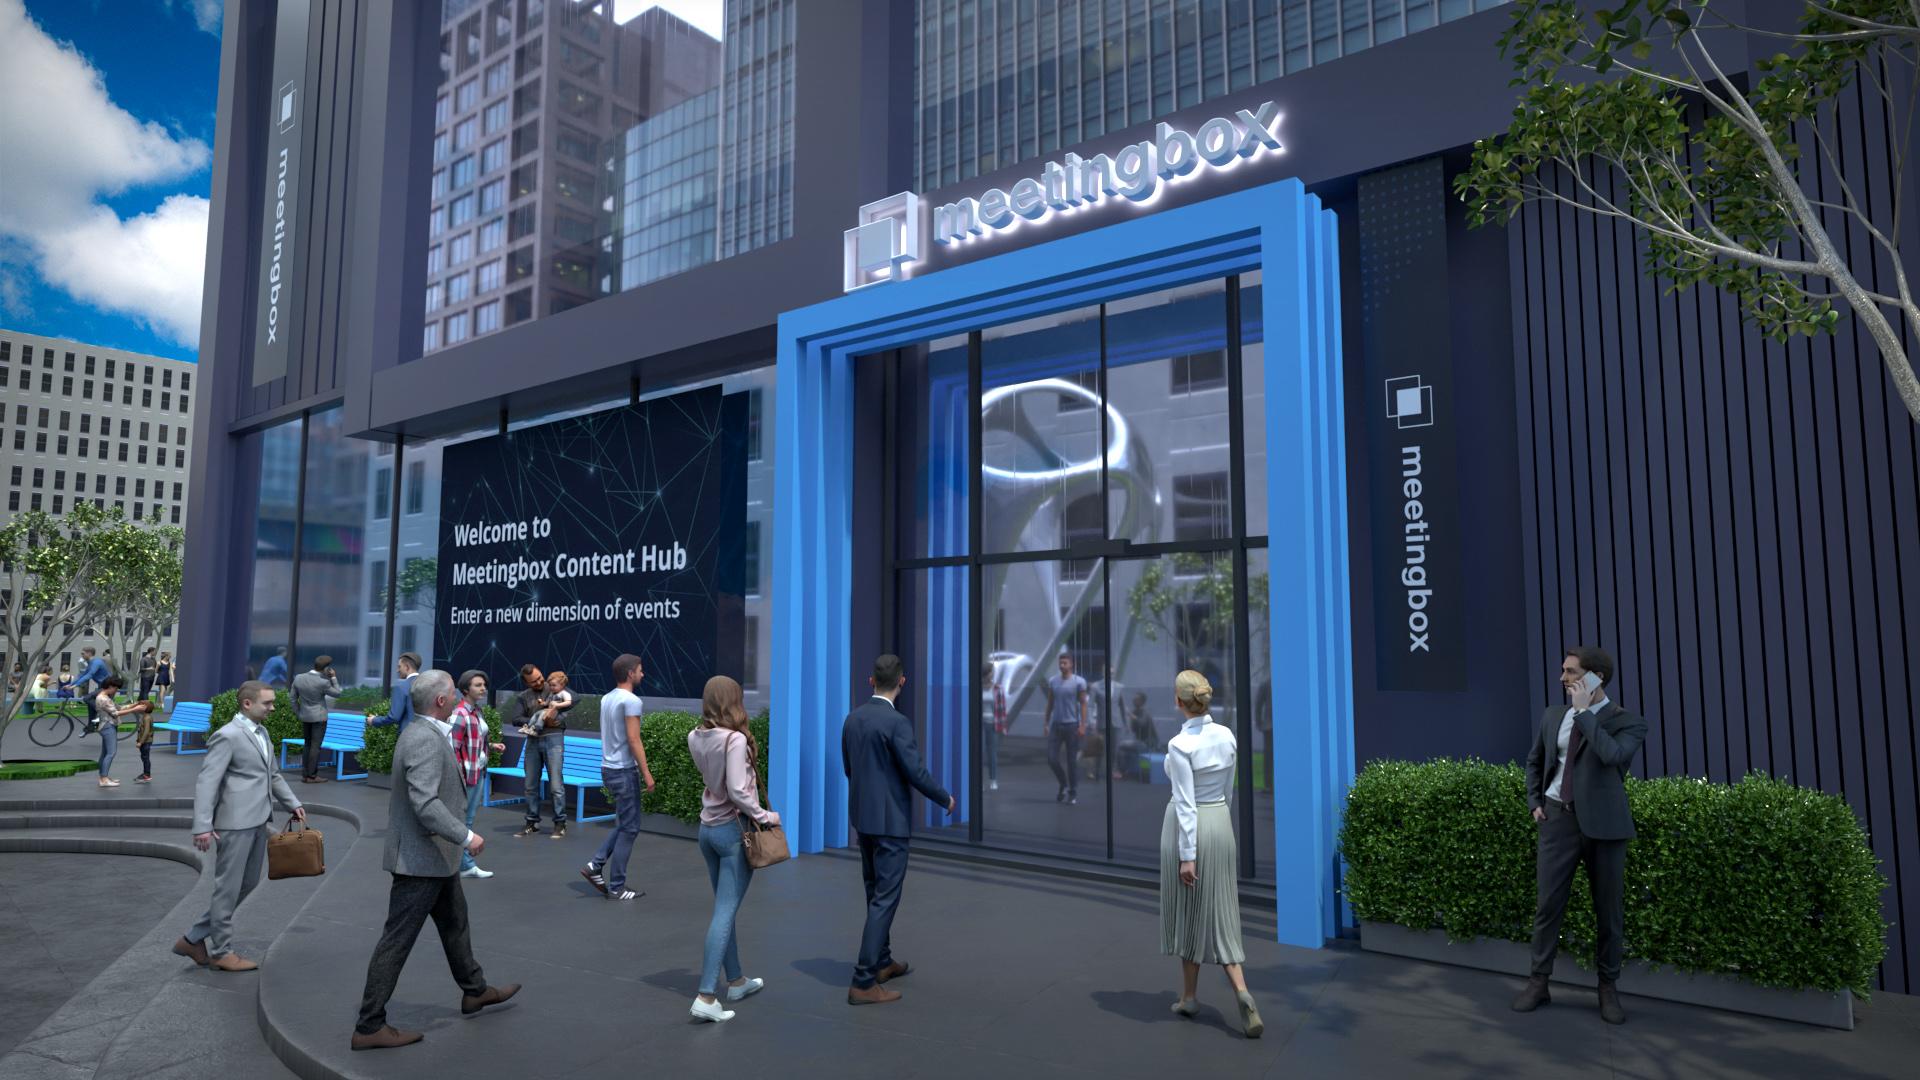 The New Meetingbox Content Hub